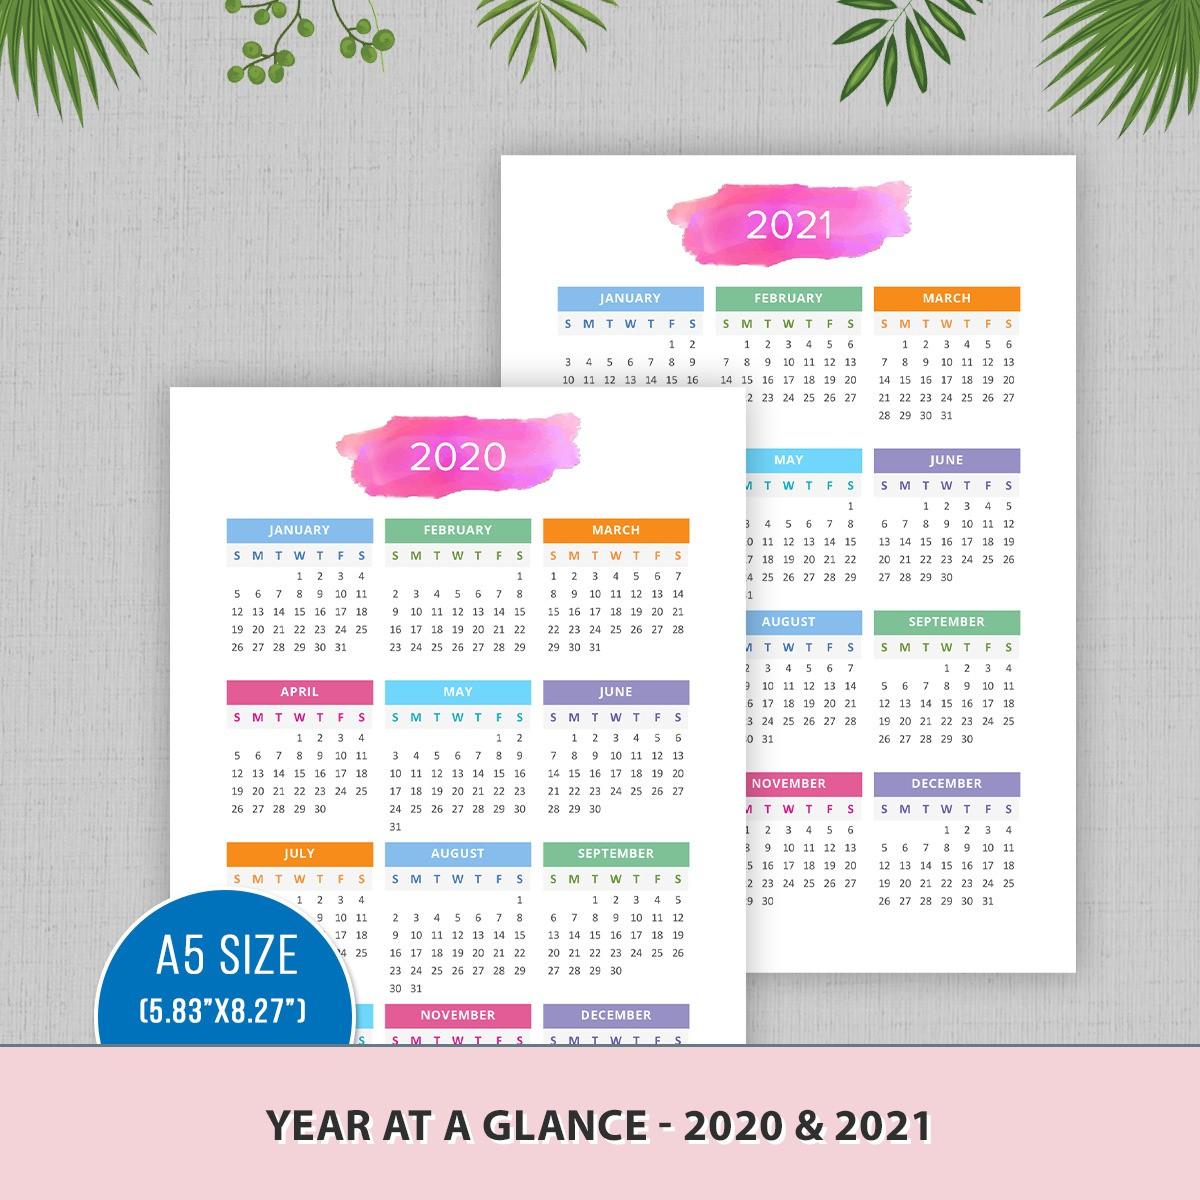 Year at a Glance 2020 & 2021